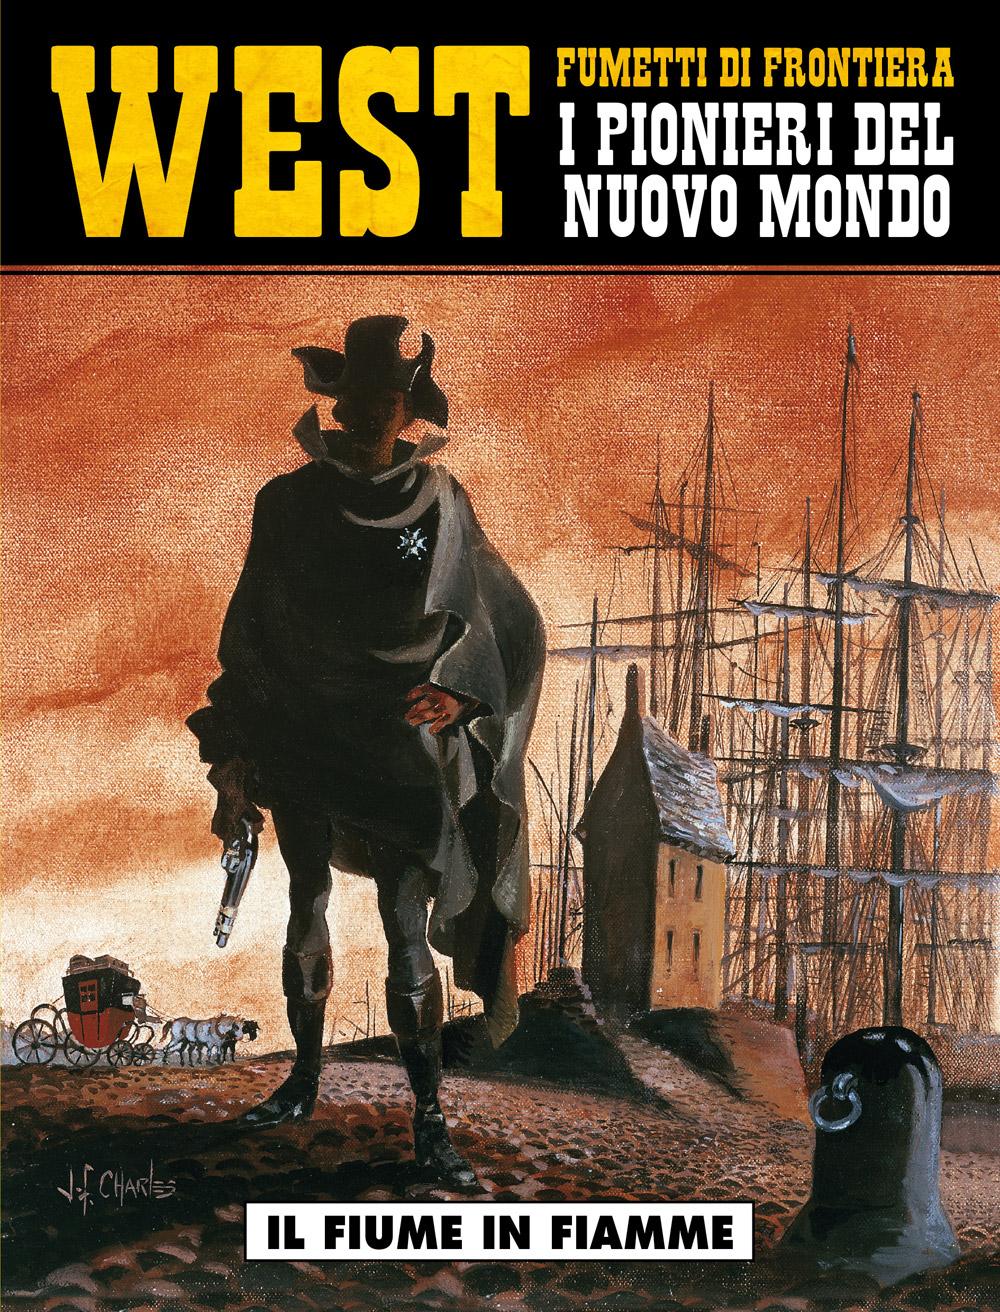 WEST - Fumetti di frontiera n. 10